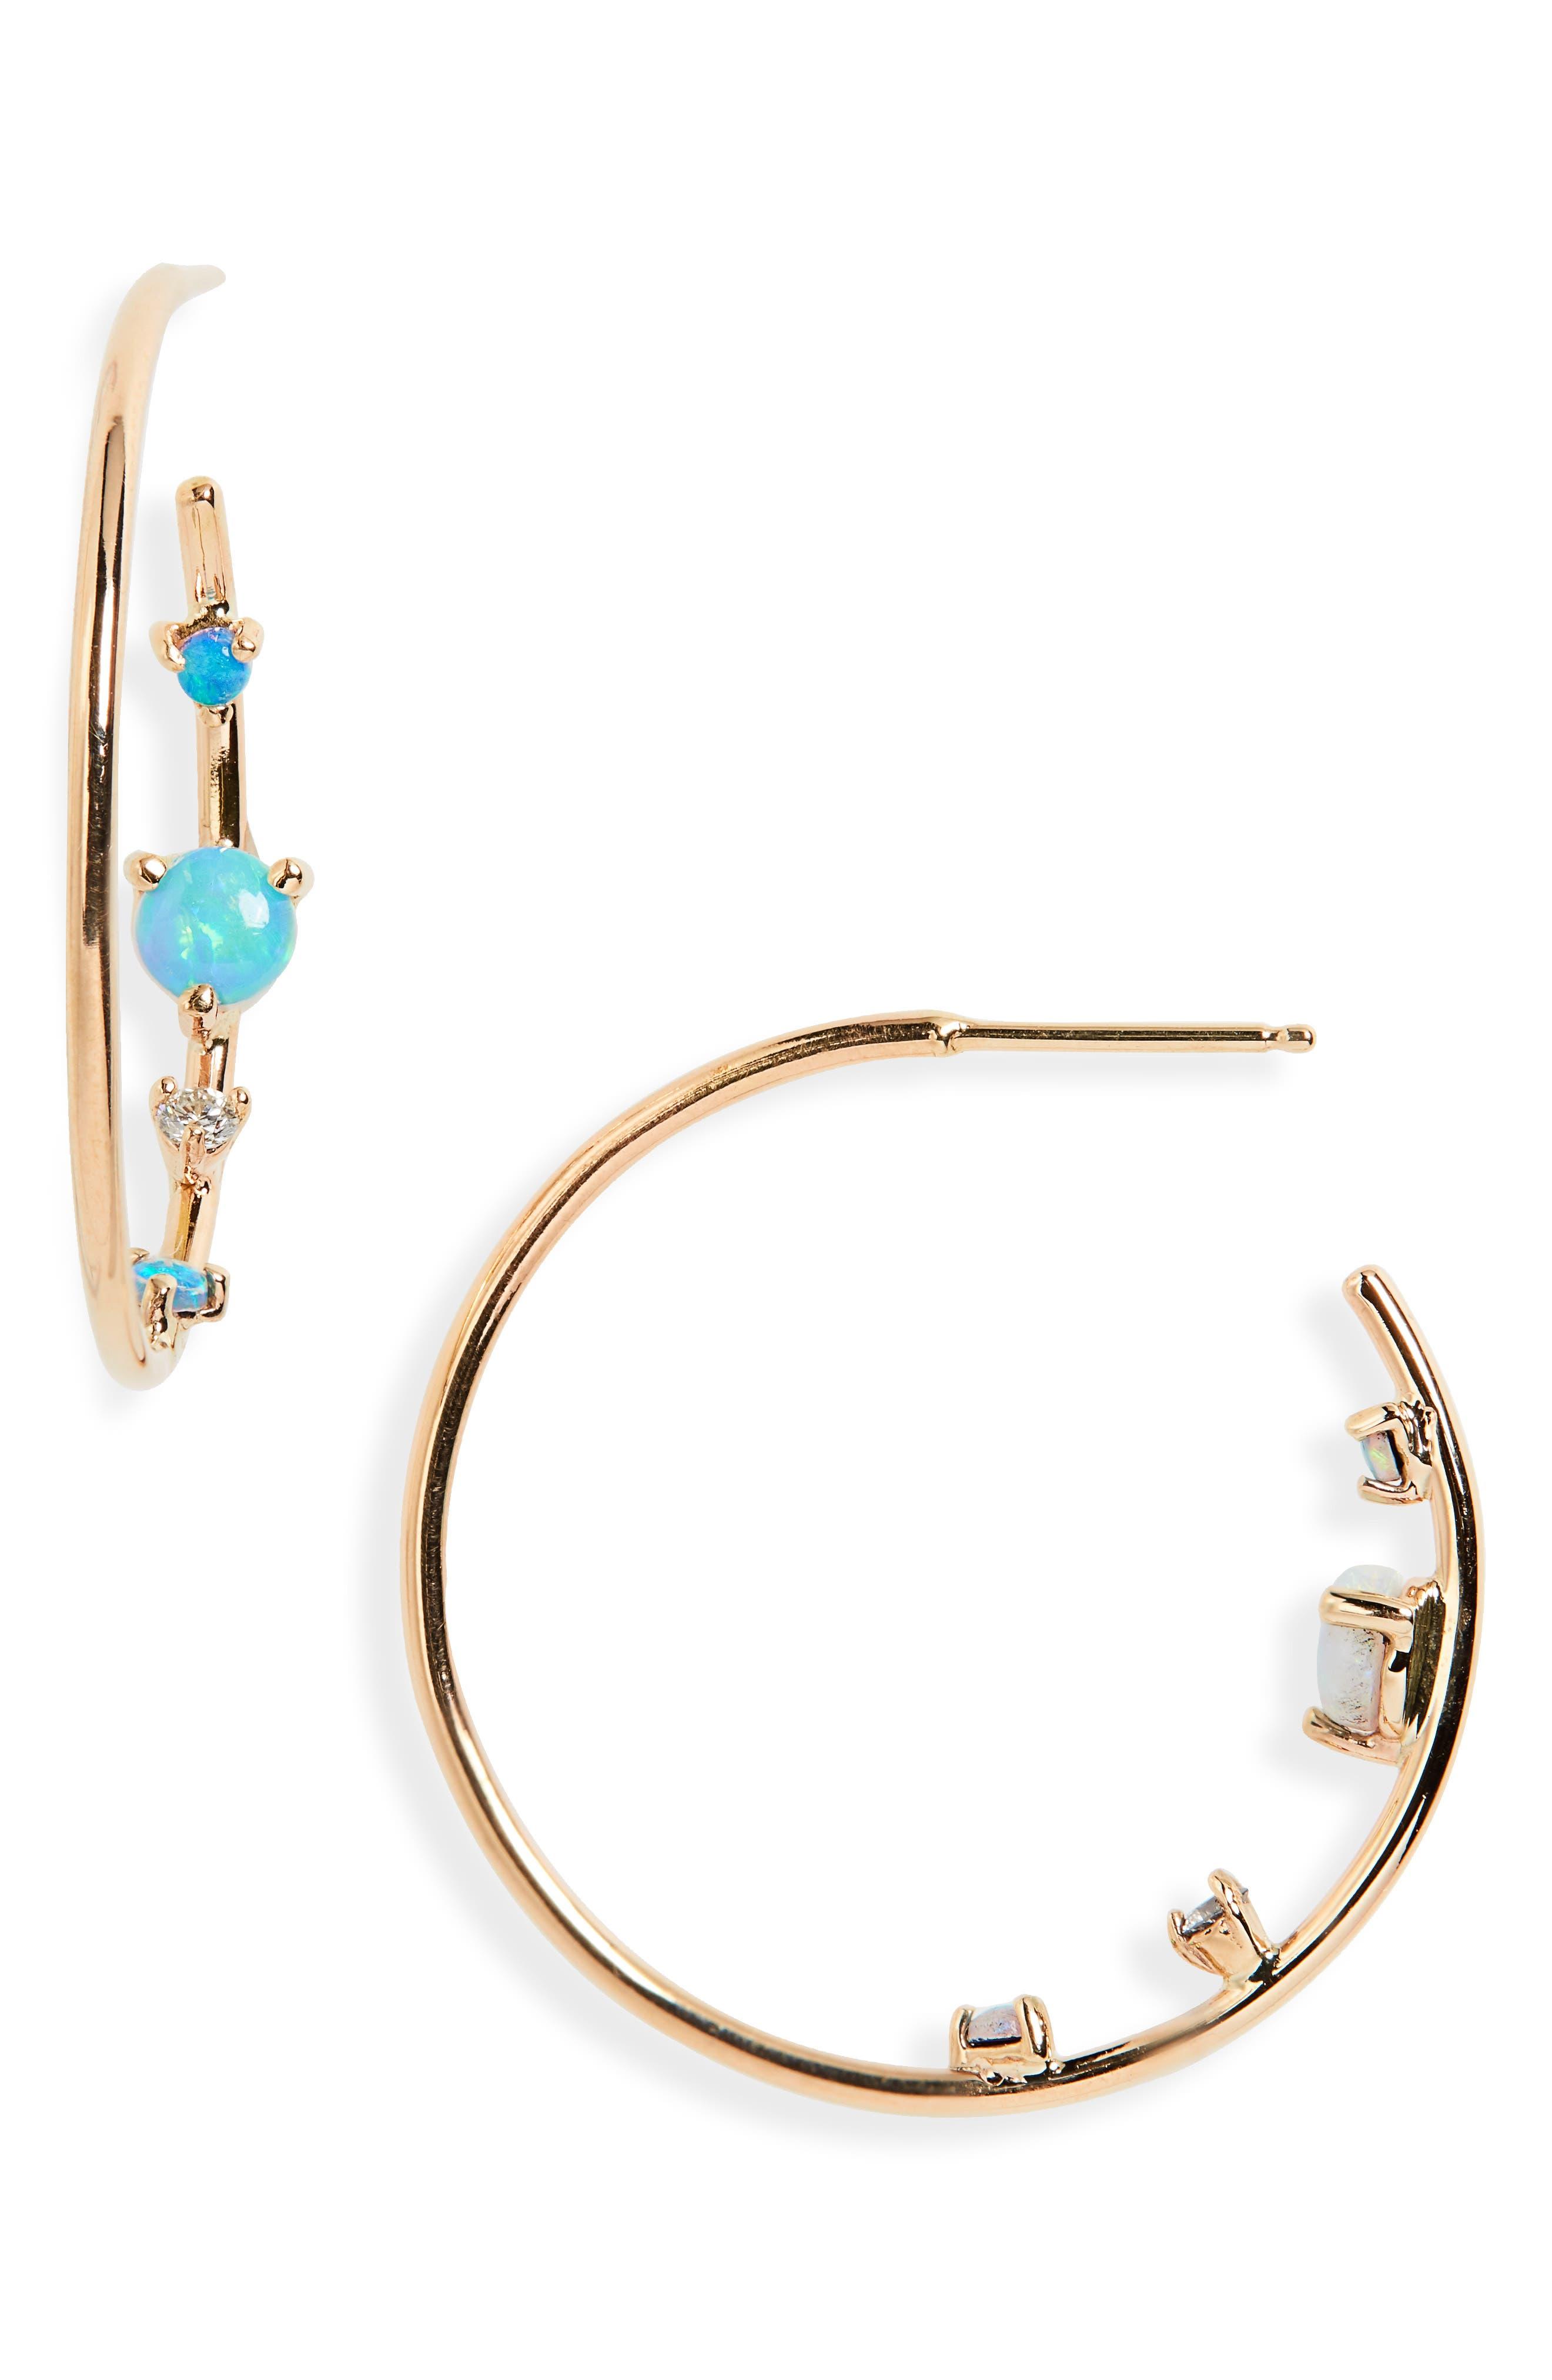 Opal & Diamond Inverted Hoop Earrings,                             Main thumbnail 1, color,                             YELLOW GOLD